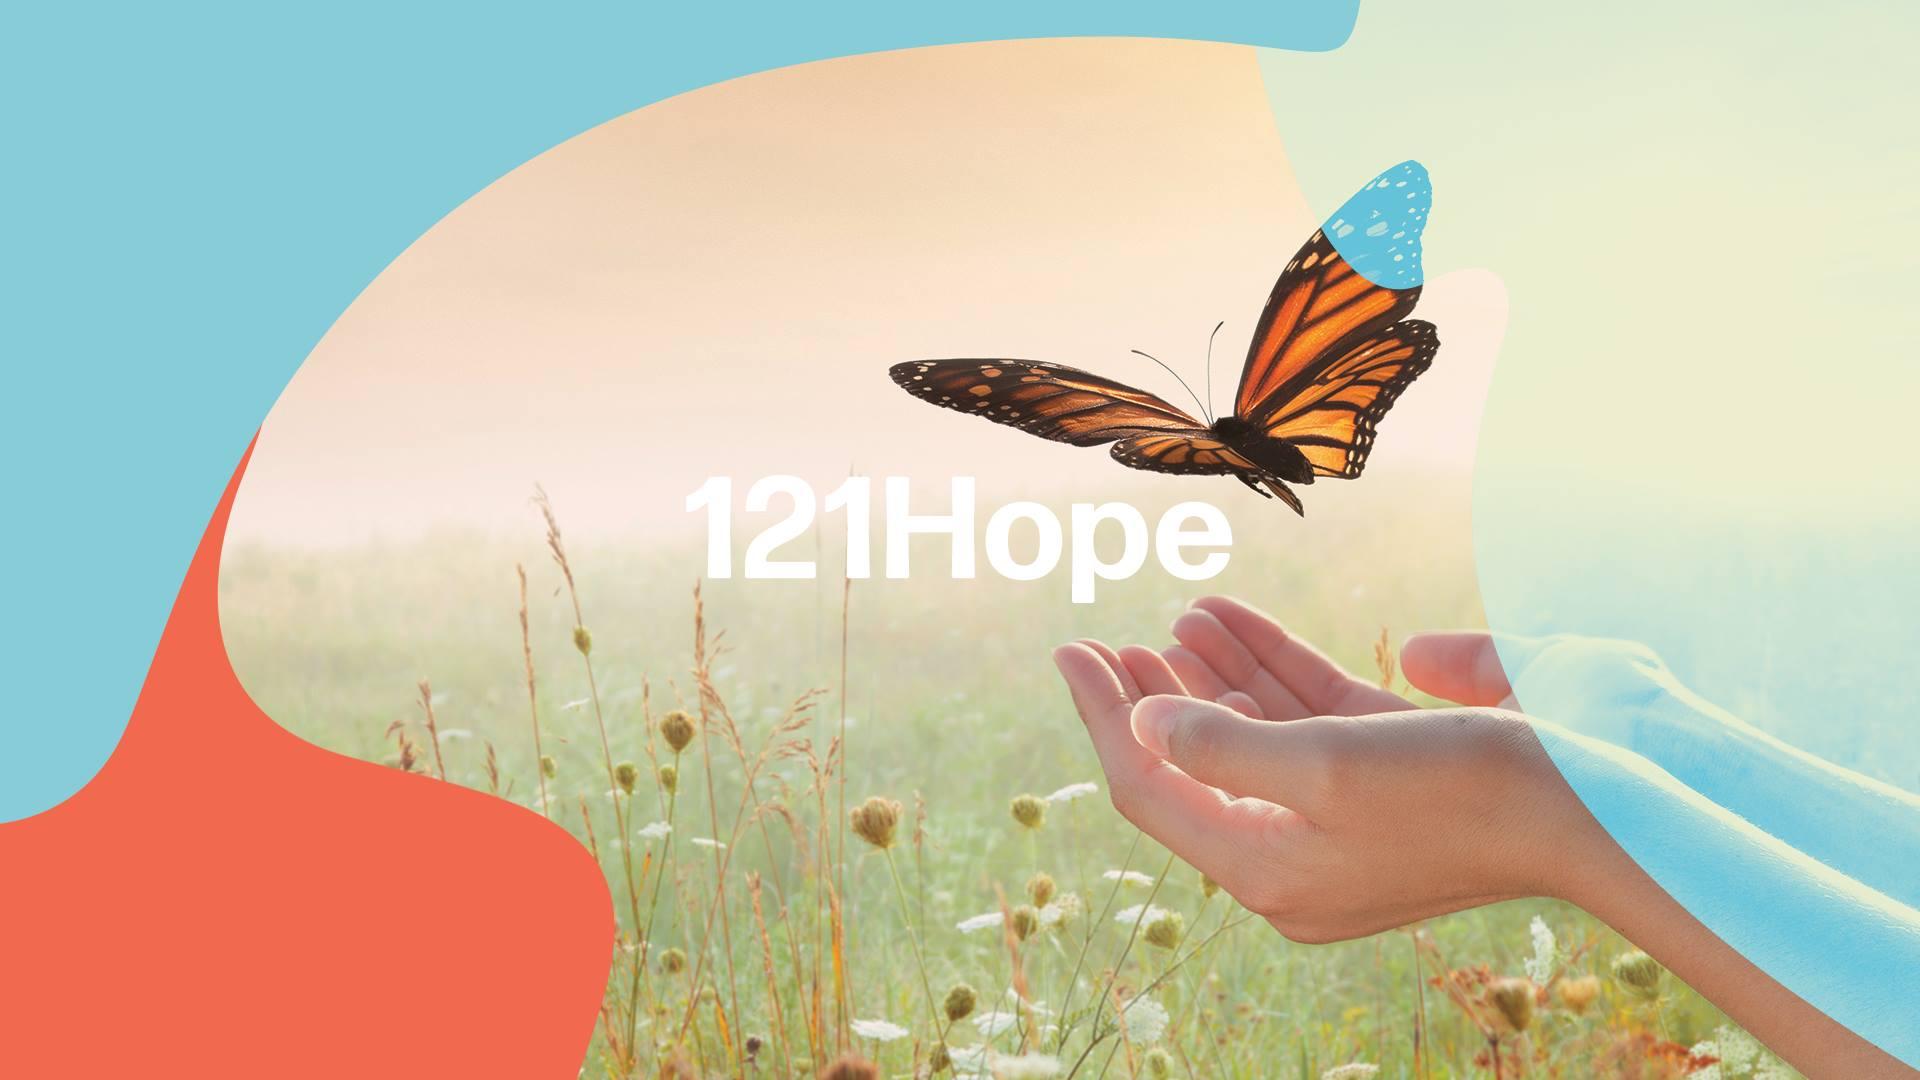 121 Hope